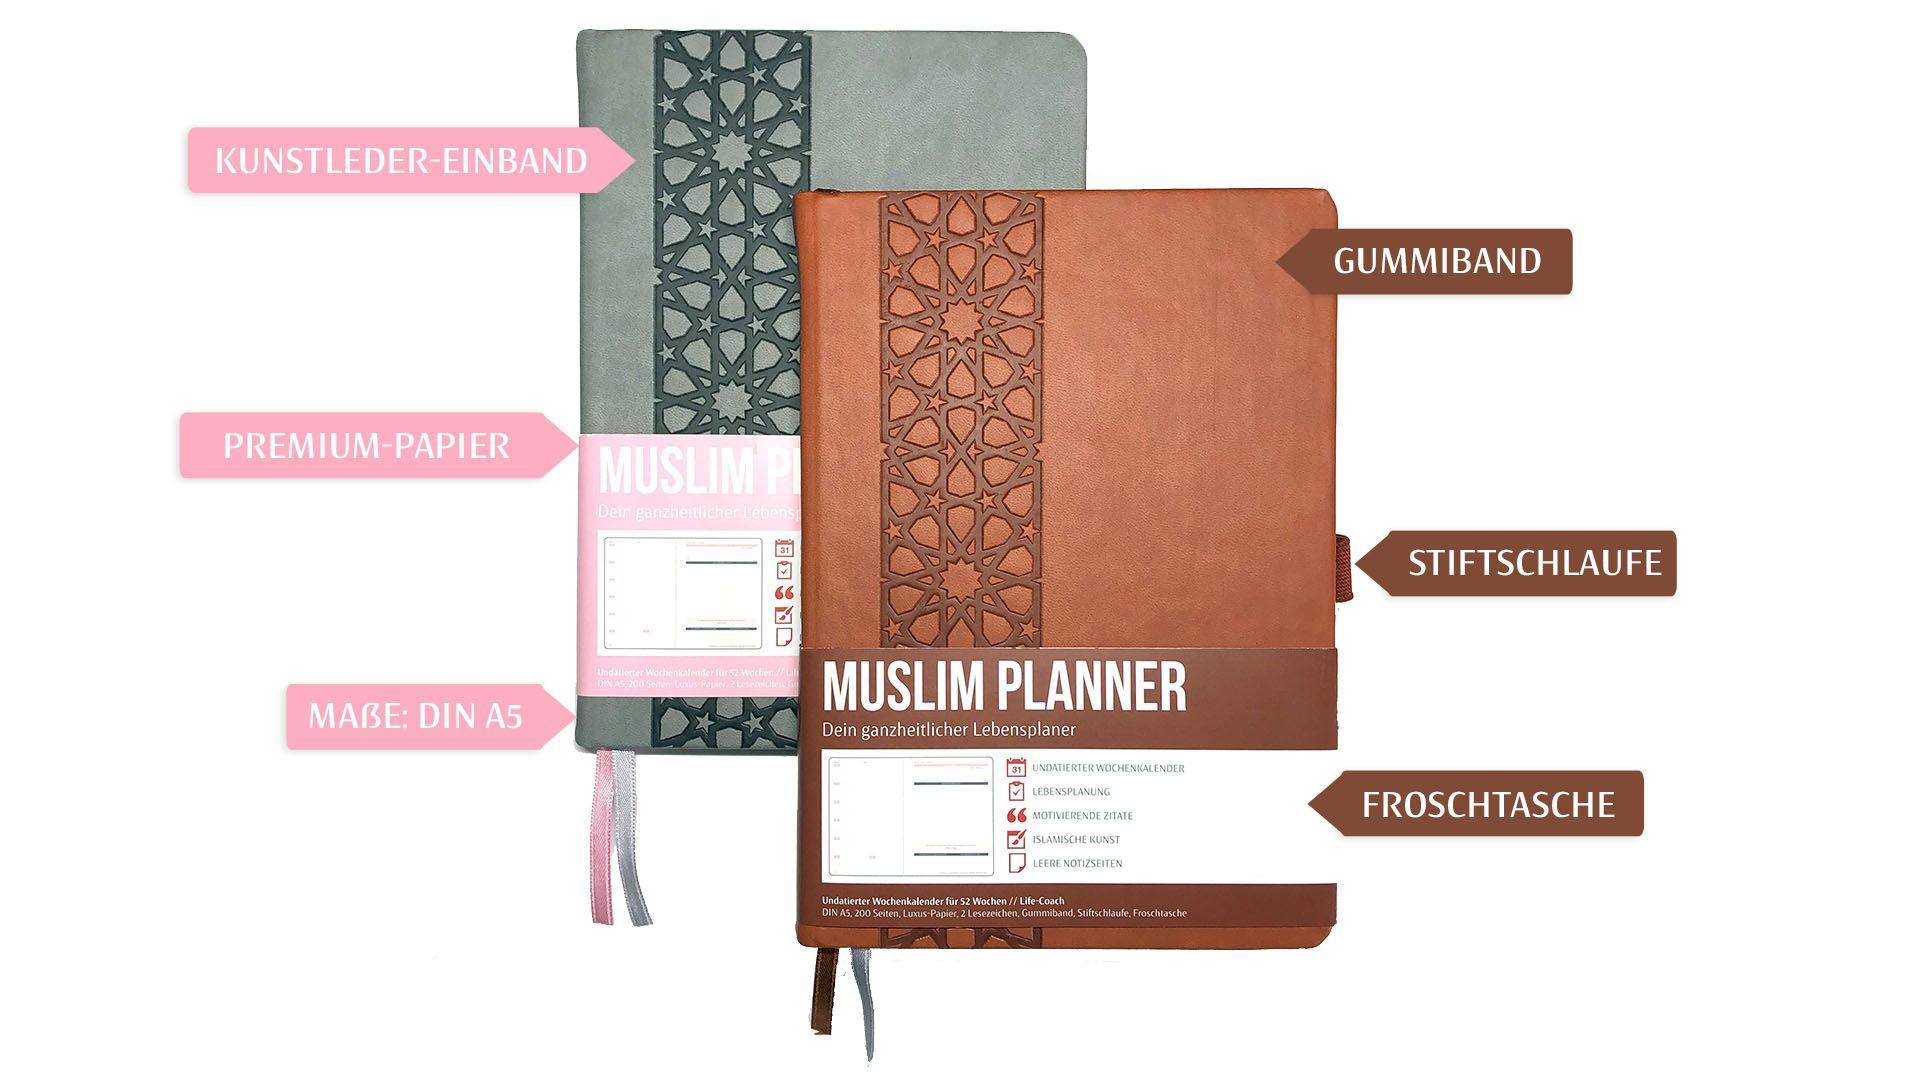 Muslim Planner - Materialien